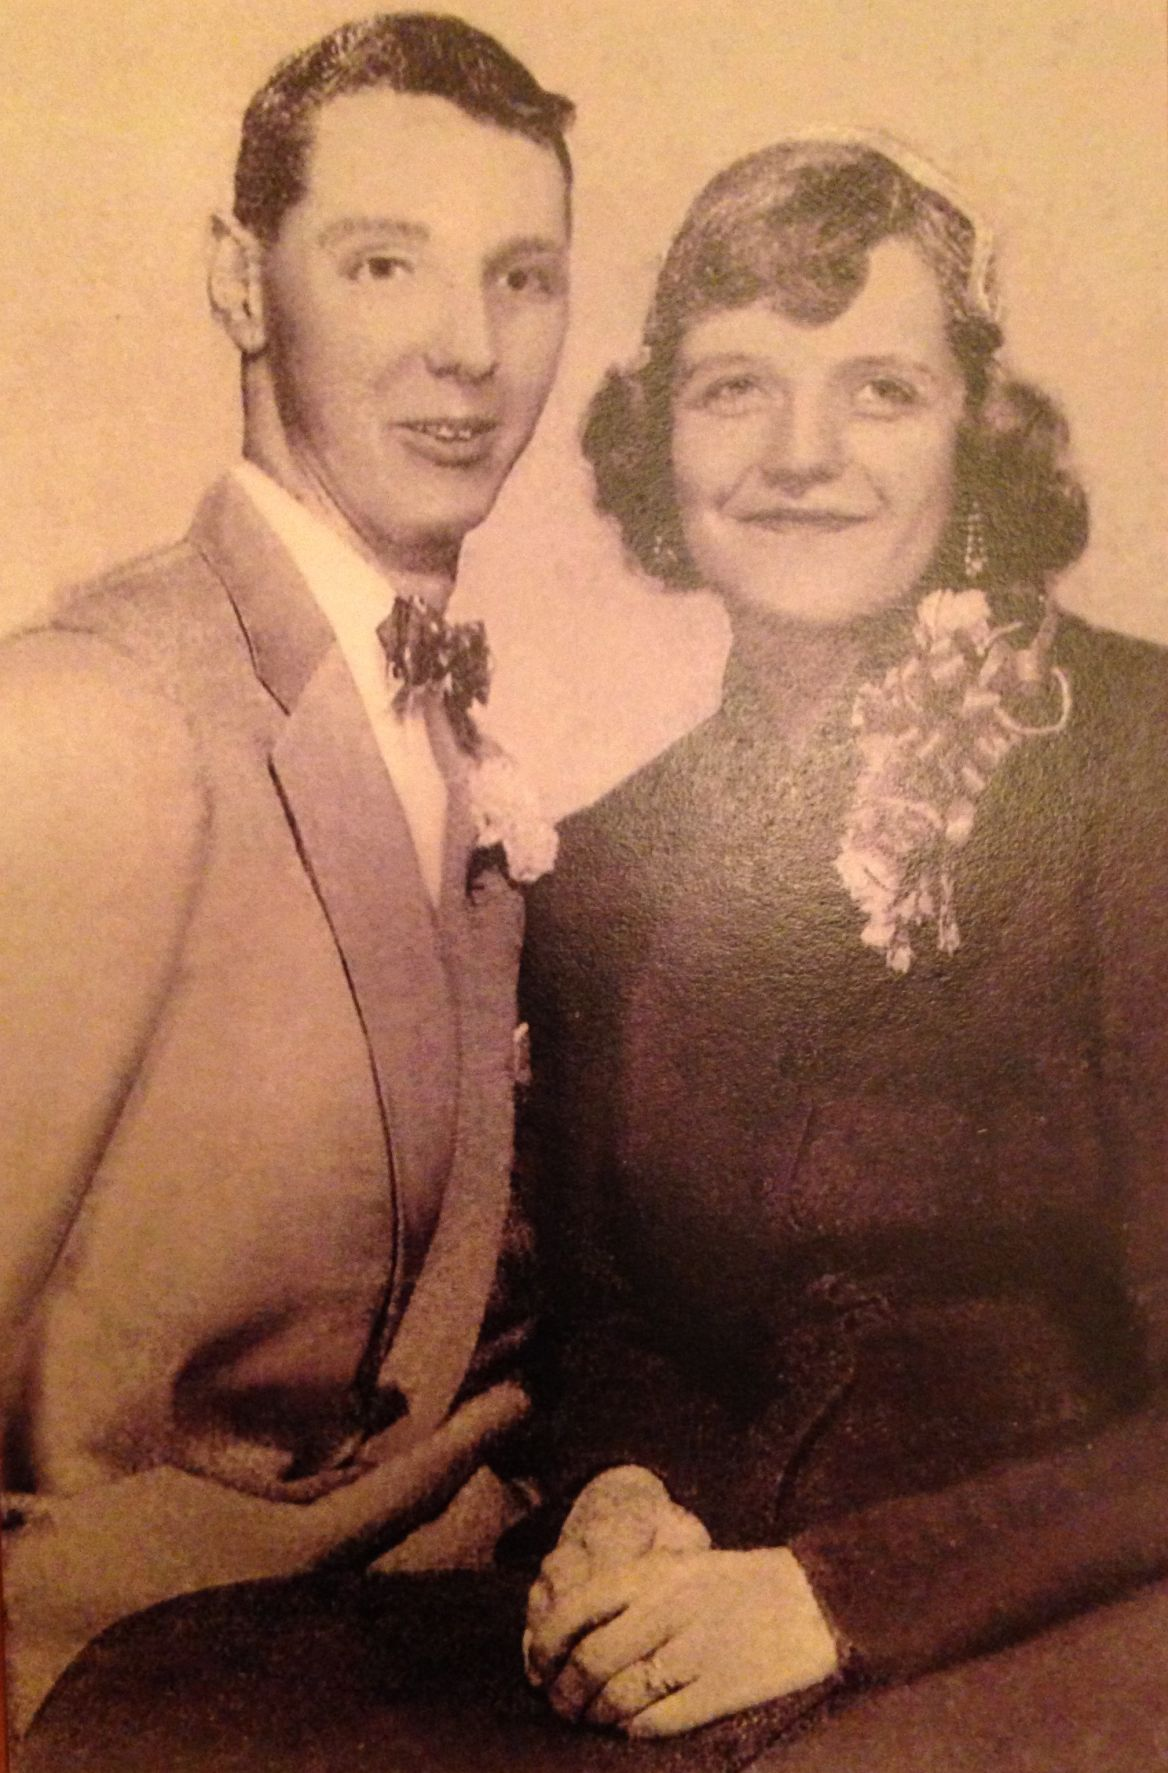 Bill and Nancy Haberman